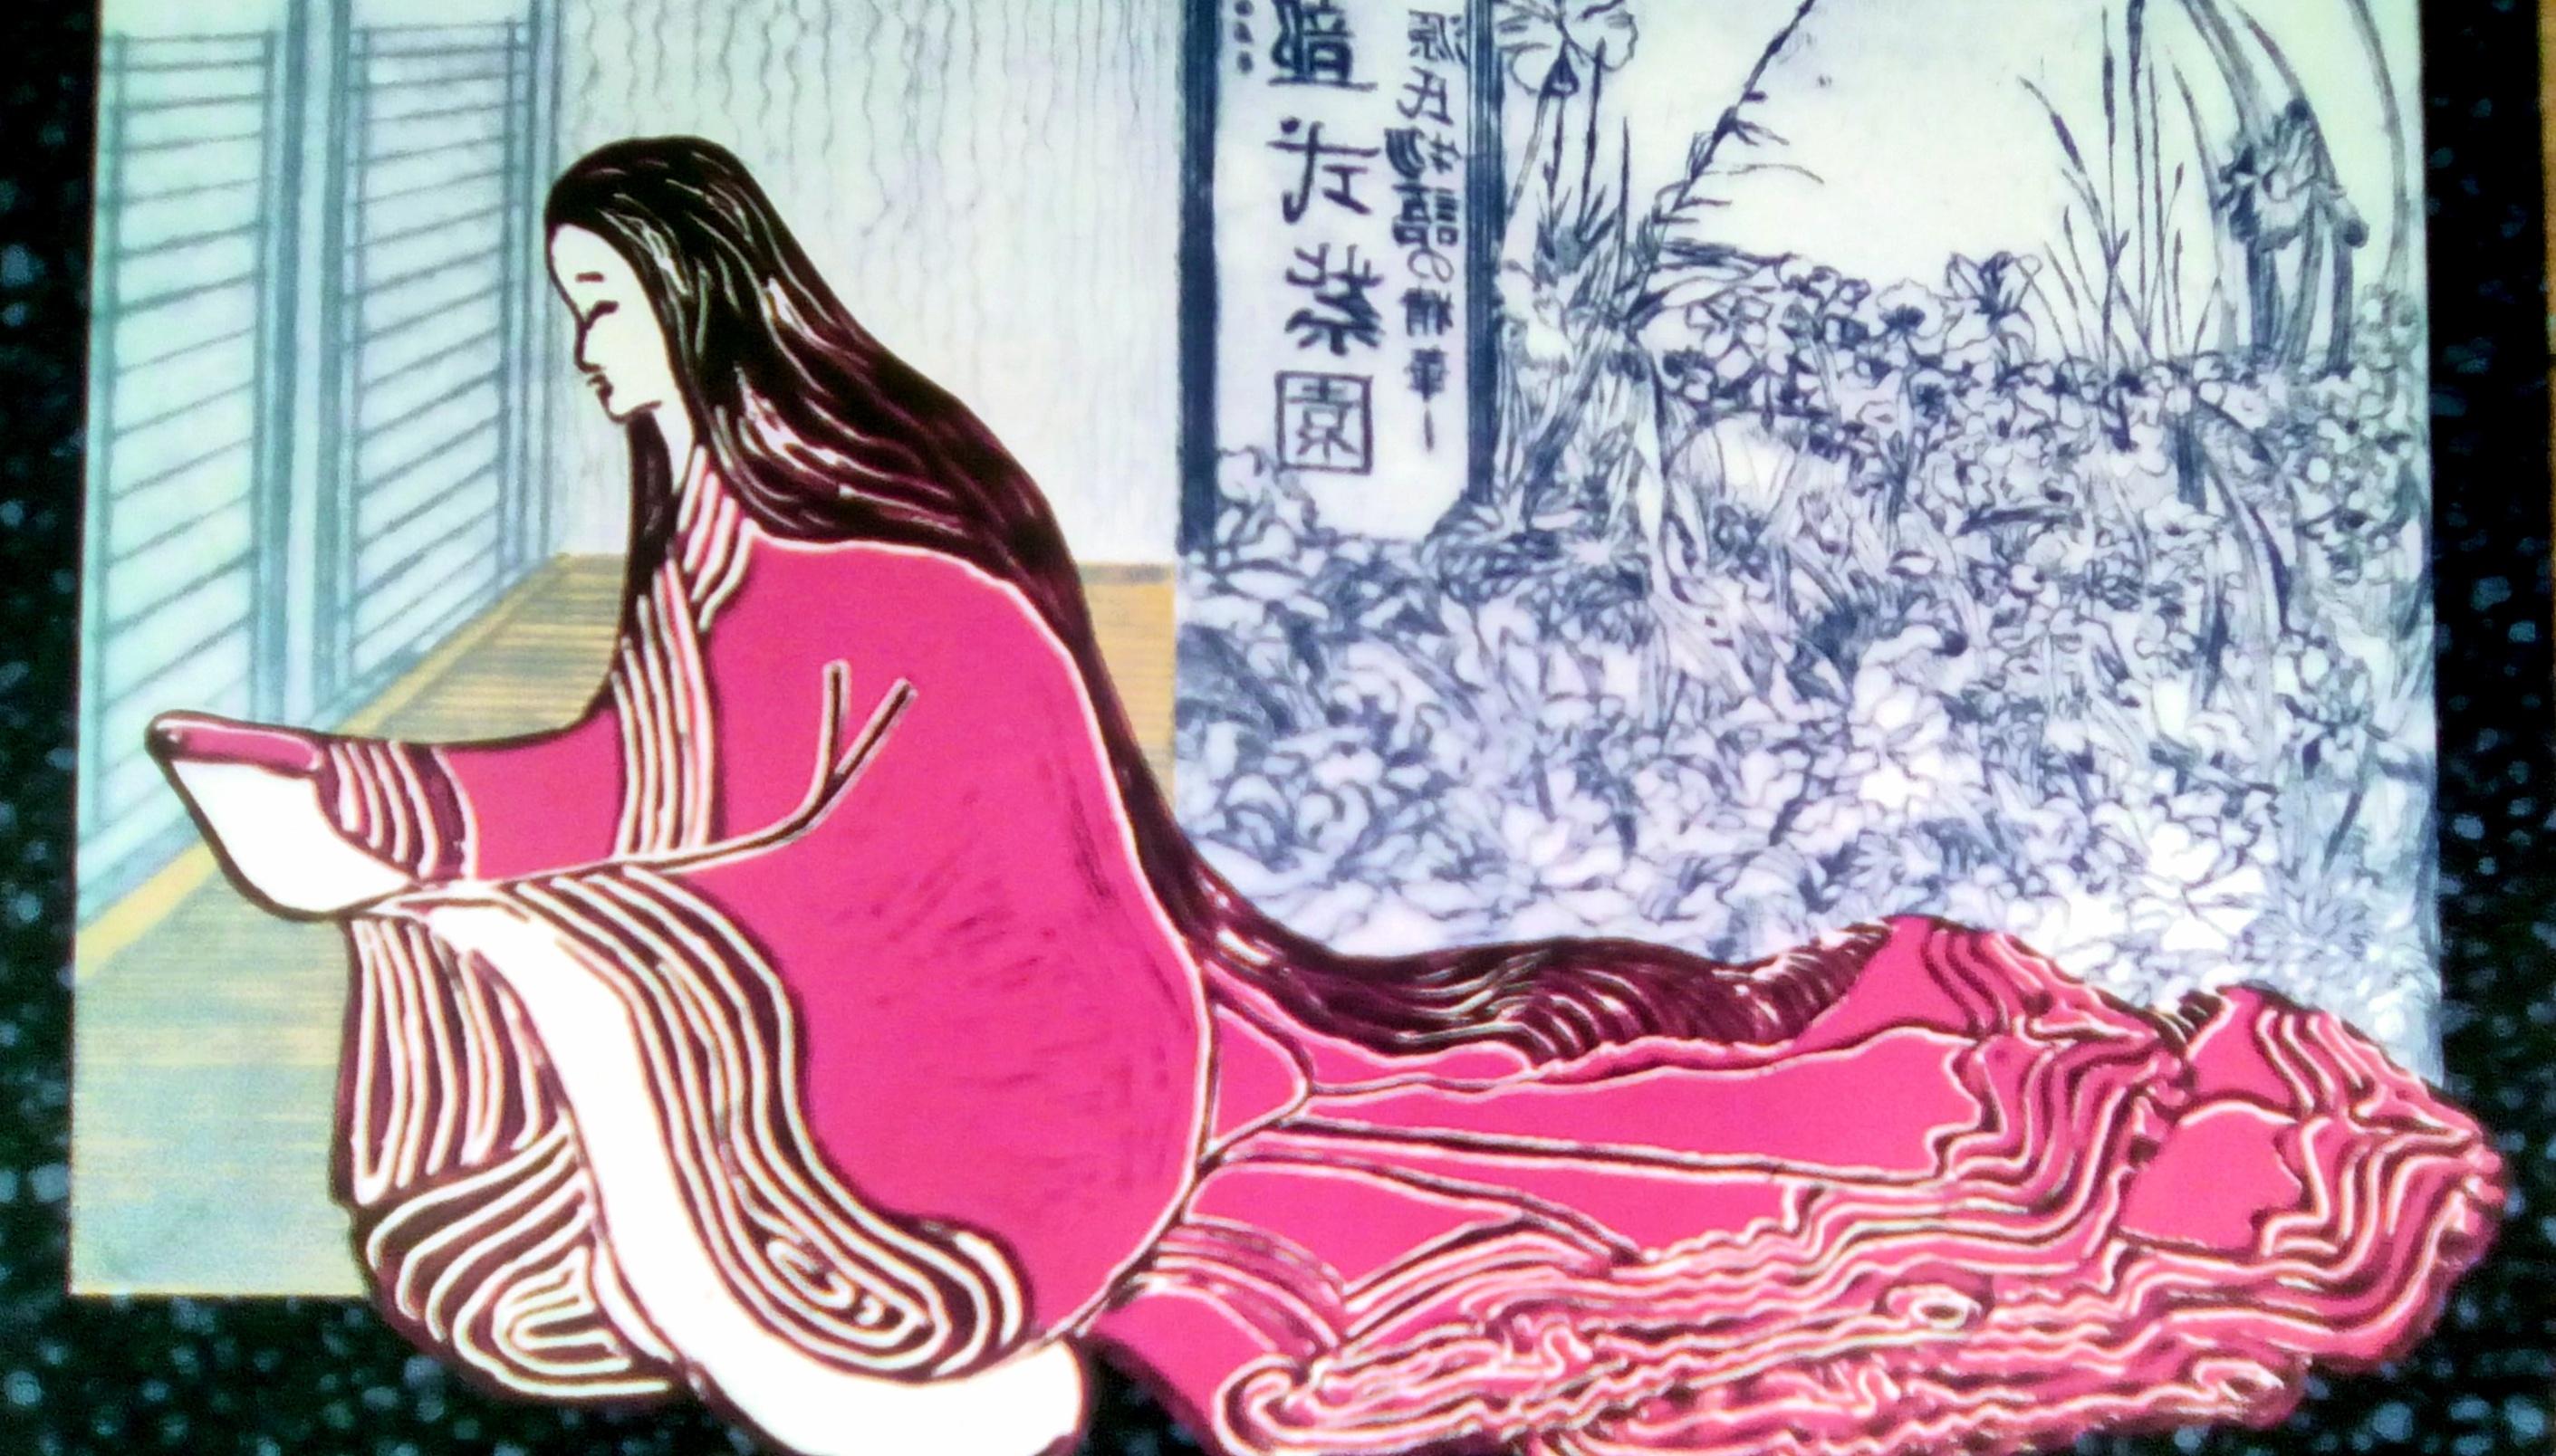 Murasaki Shikubu